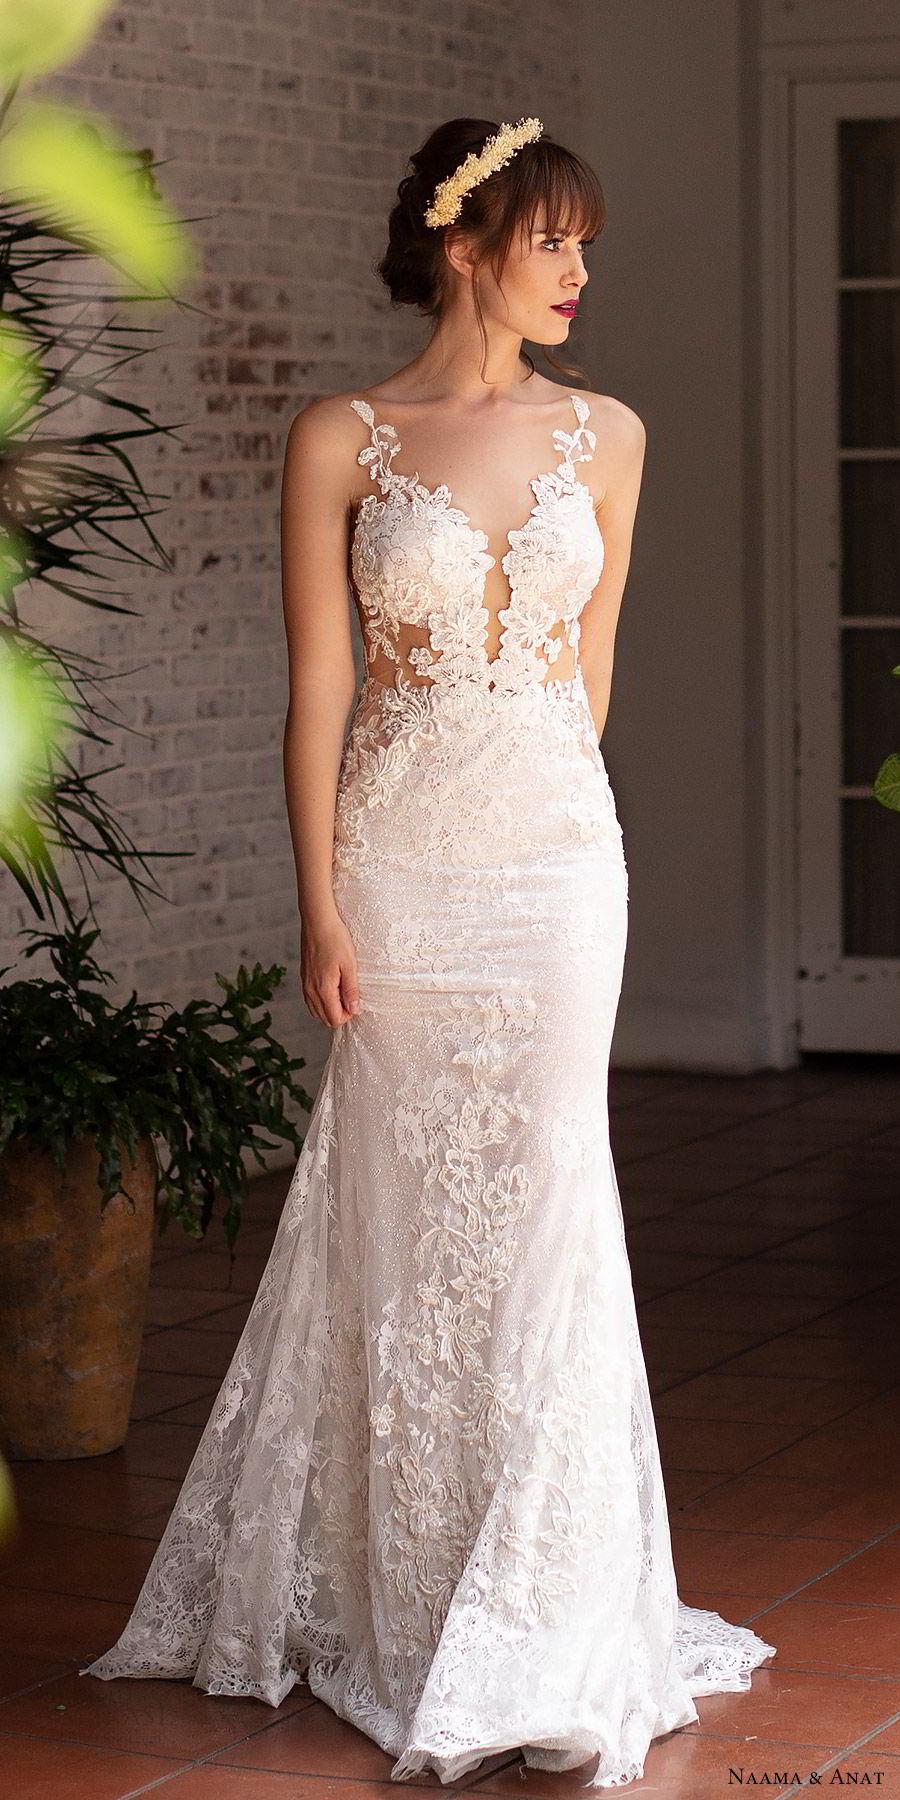 naama anat 2019 bridal sleeveless deep plunging sweetheart neckline sheath fit flare lace wedding dress low back chapel train sexy elegant (3) mv